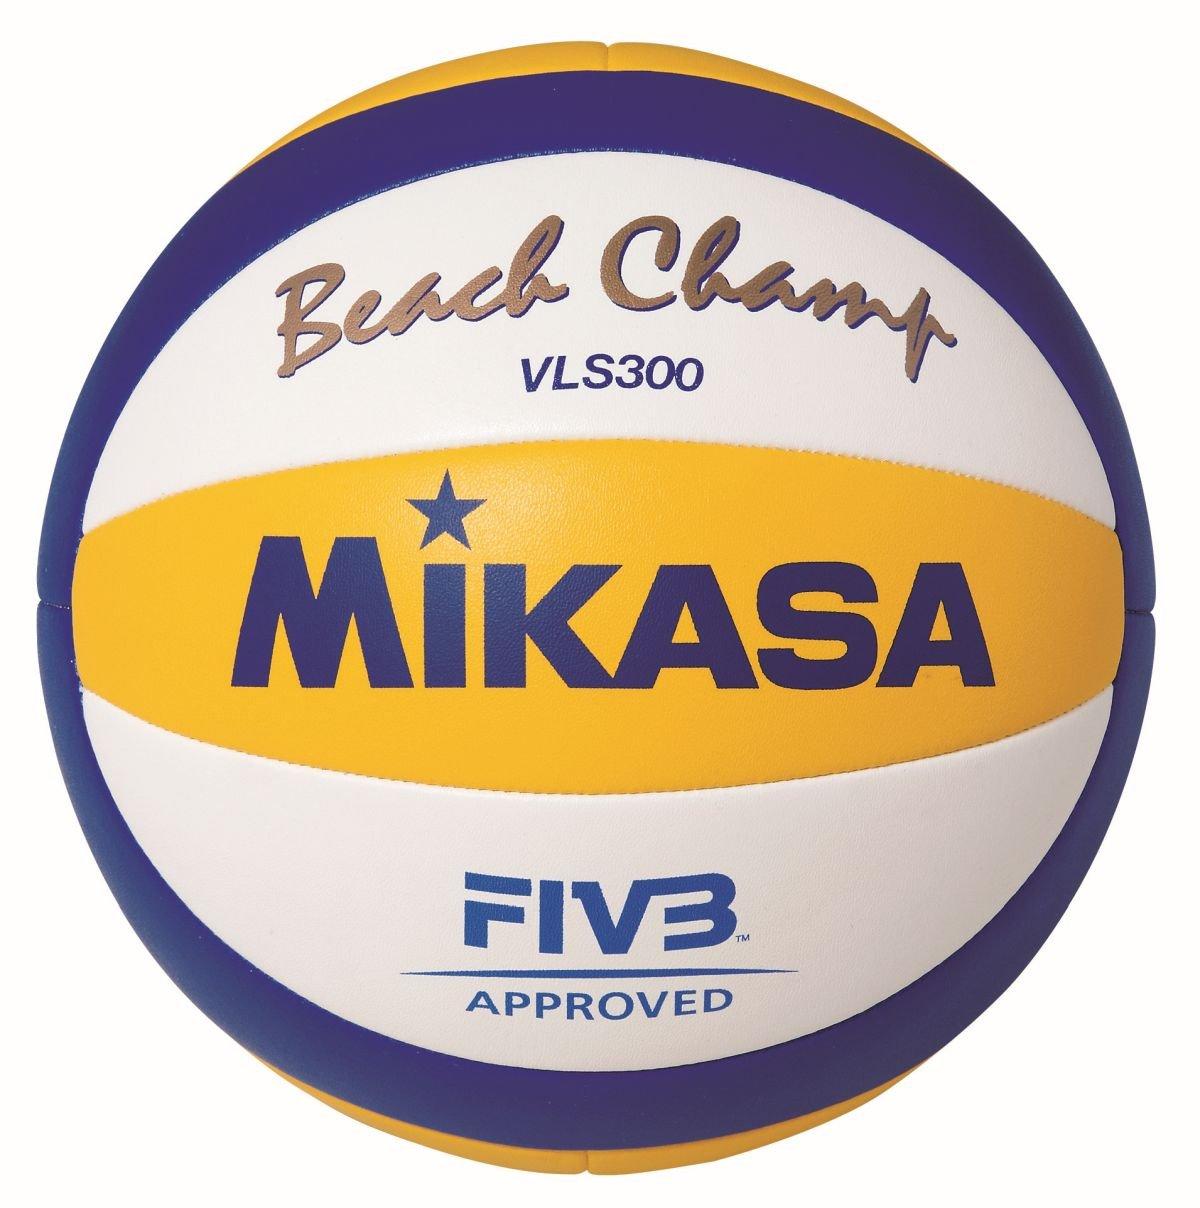 Mikasa Beach Champ VLS 300de DVV, modelo 2018 MIKDI|#MIKASA 1608